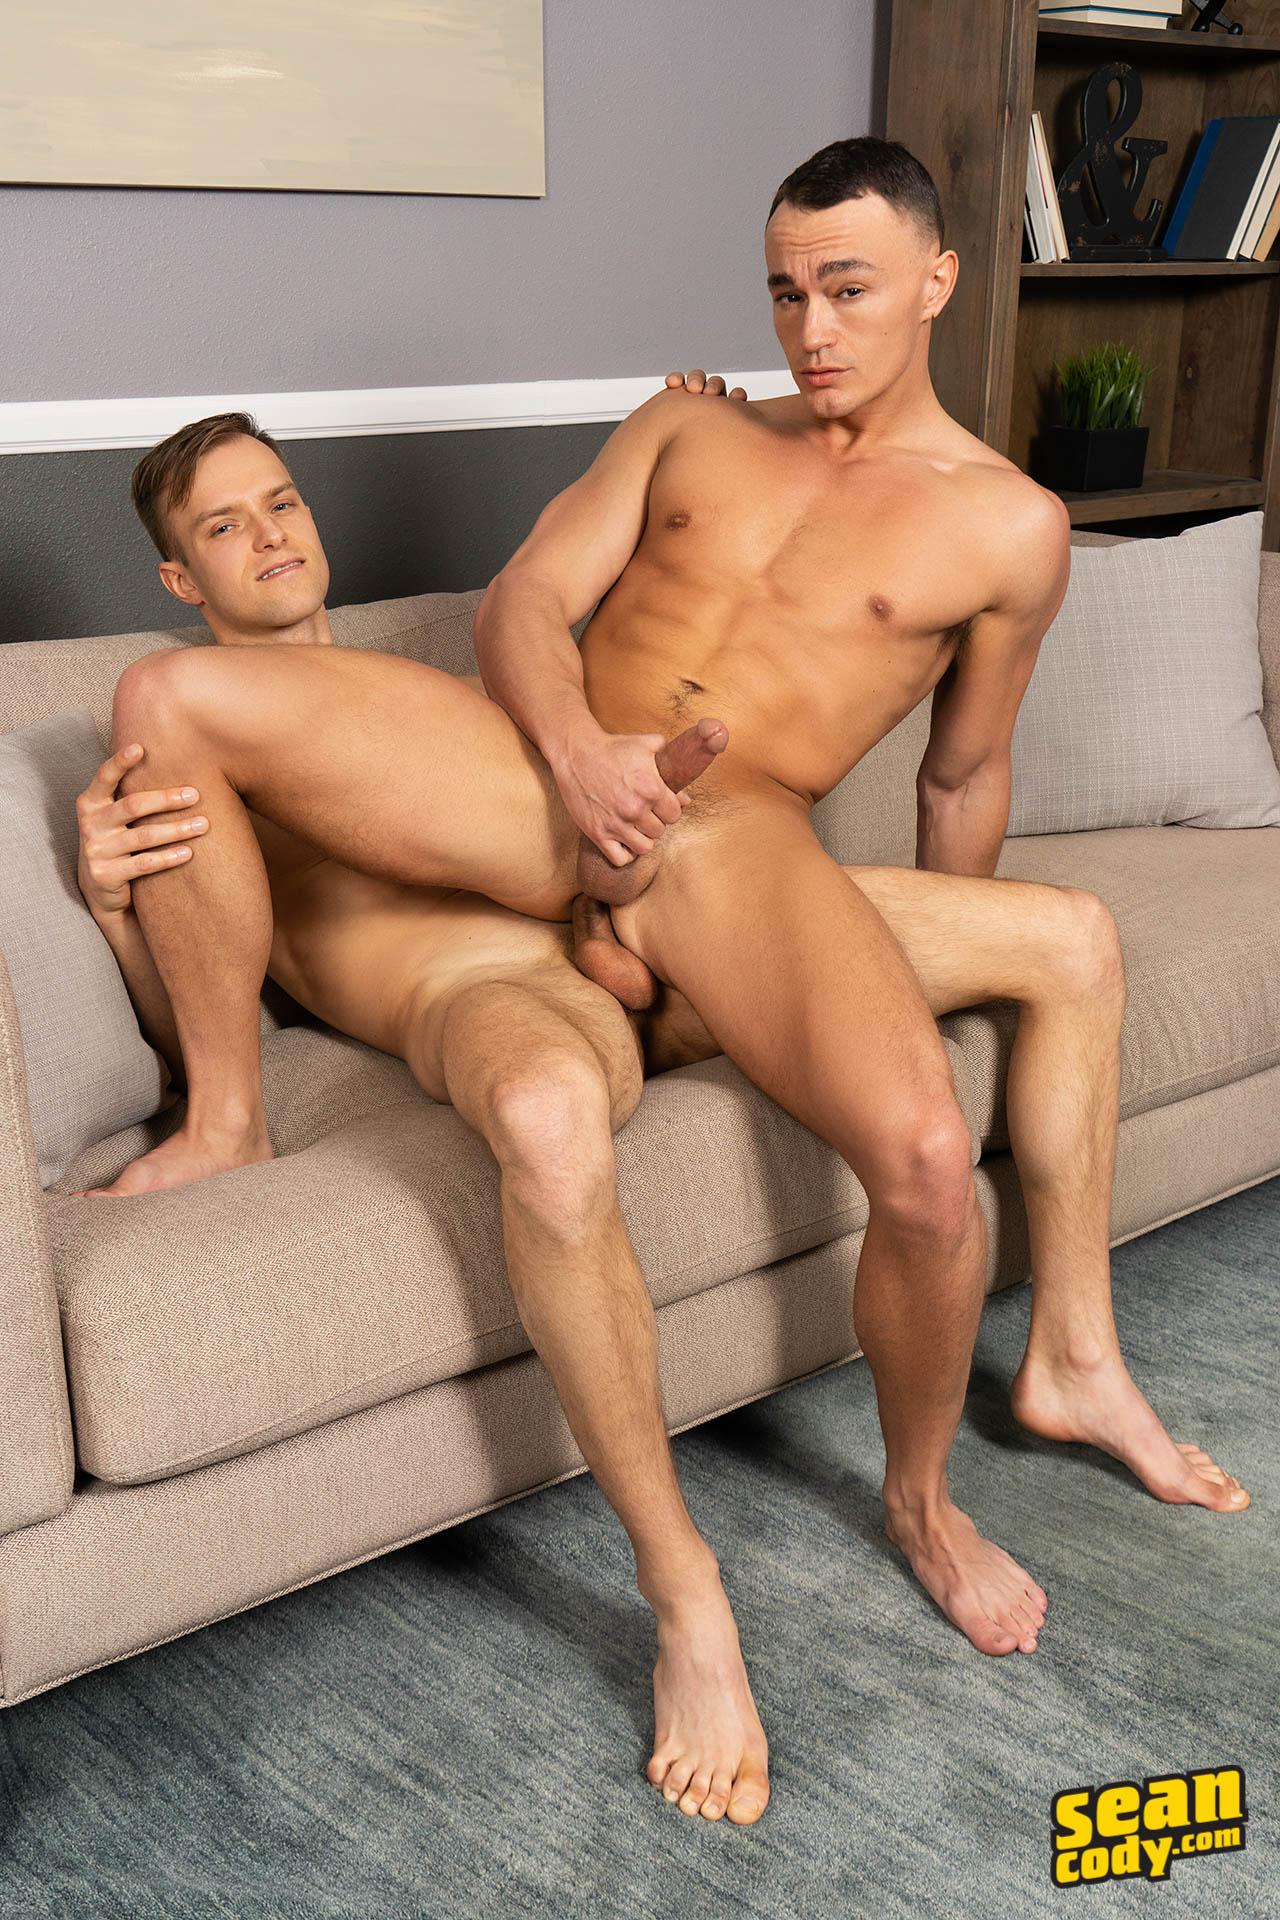 Sean Cody gay hunks sucking and fucking